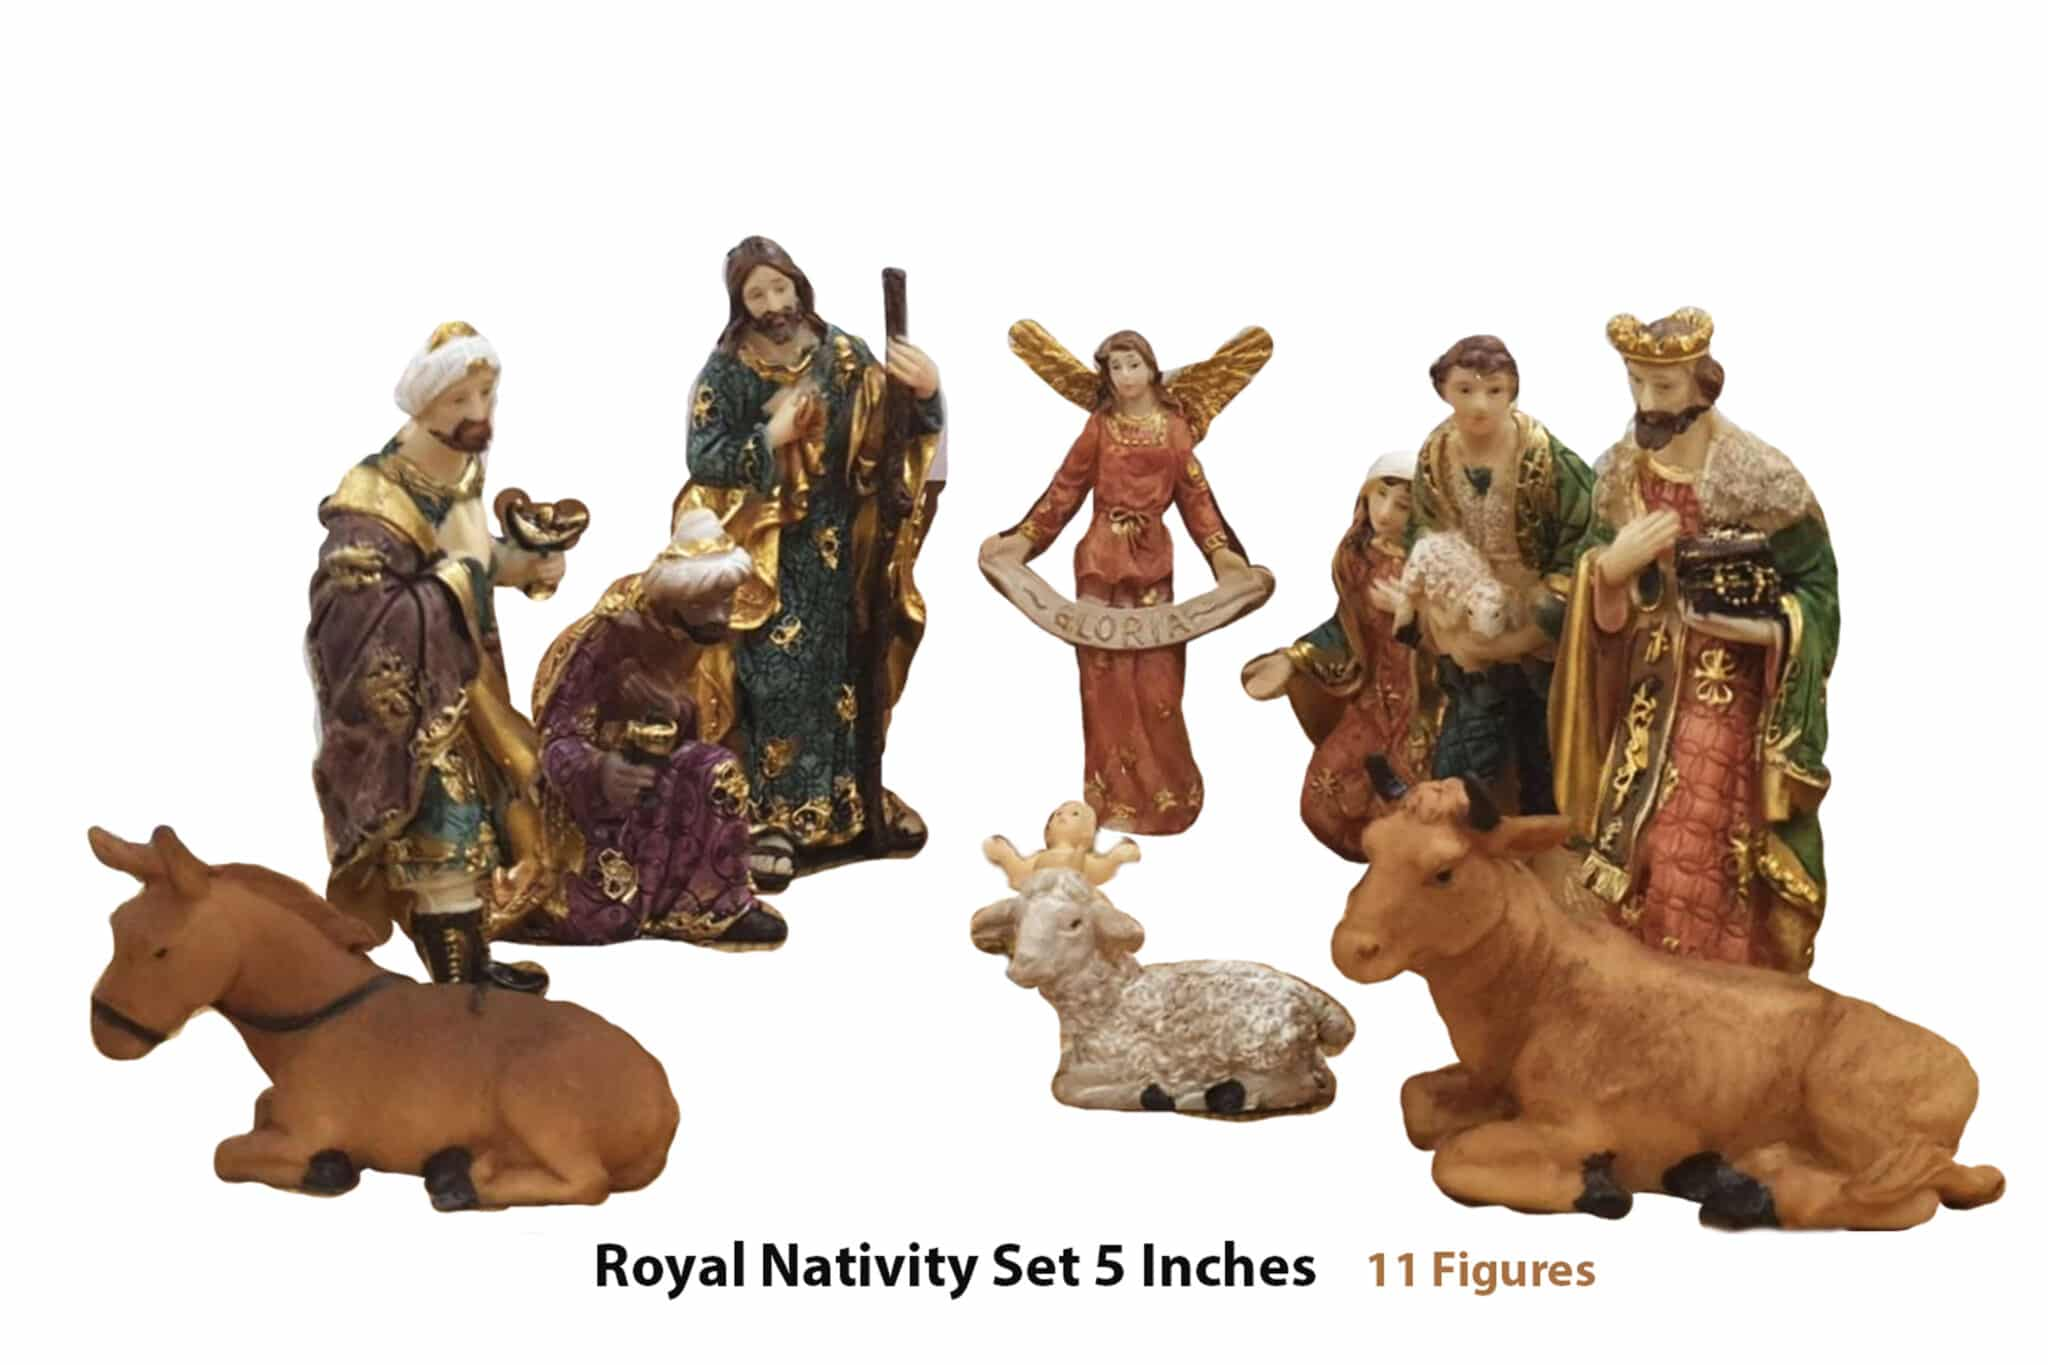 Christmas Nativity Set 5 inches